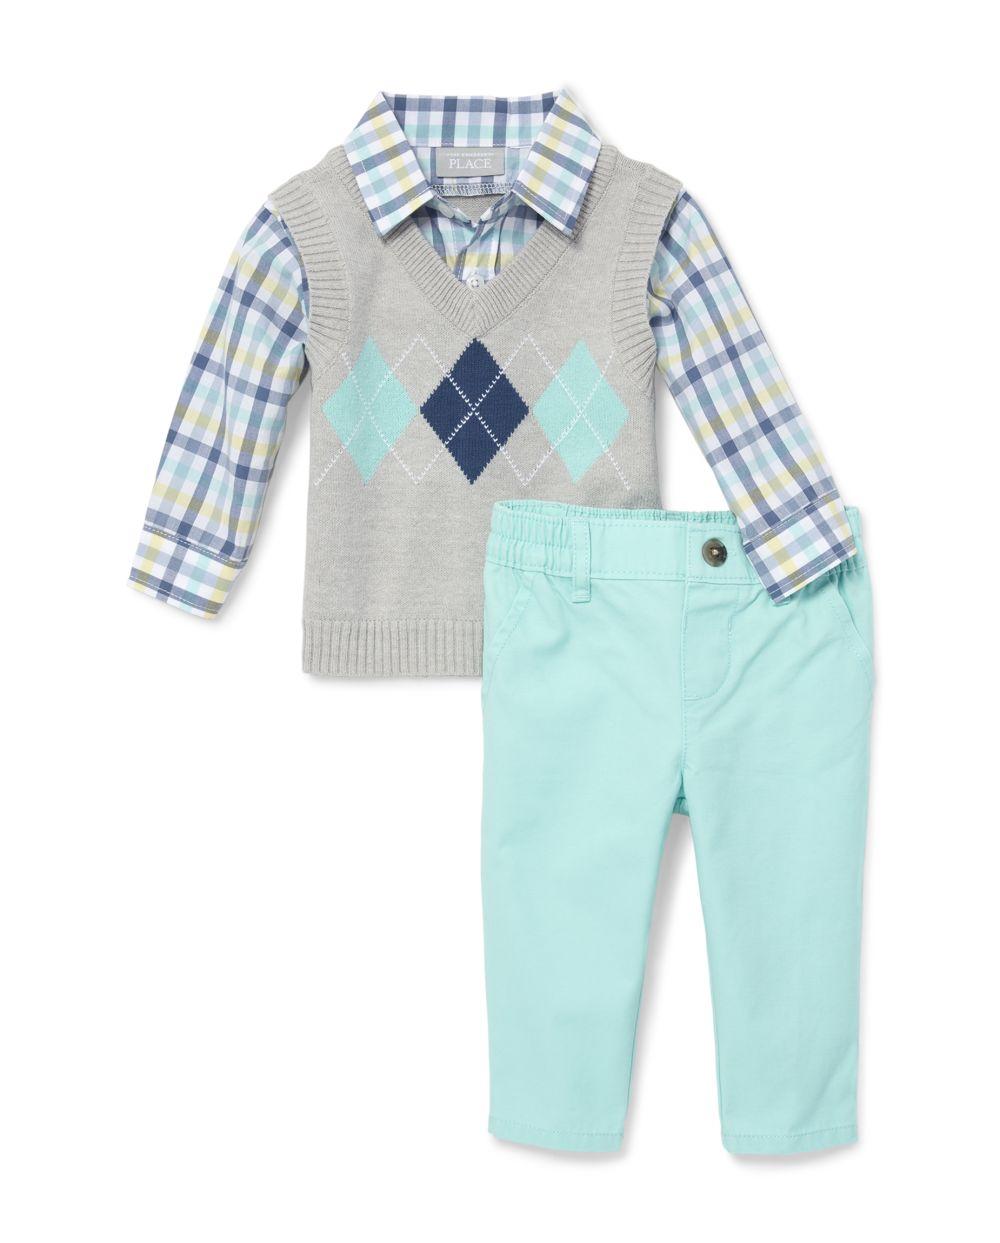 Baby Boys Argyle Outfit Set